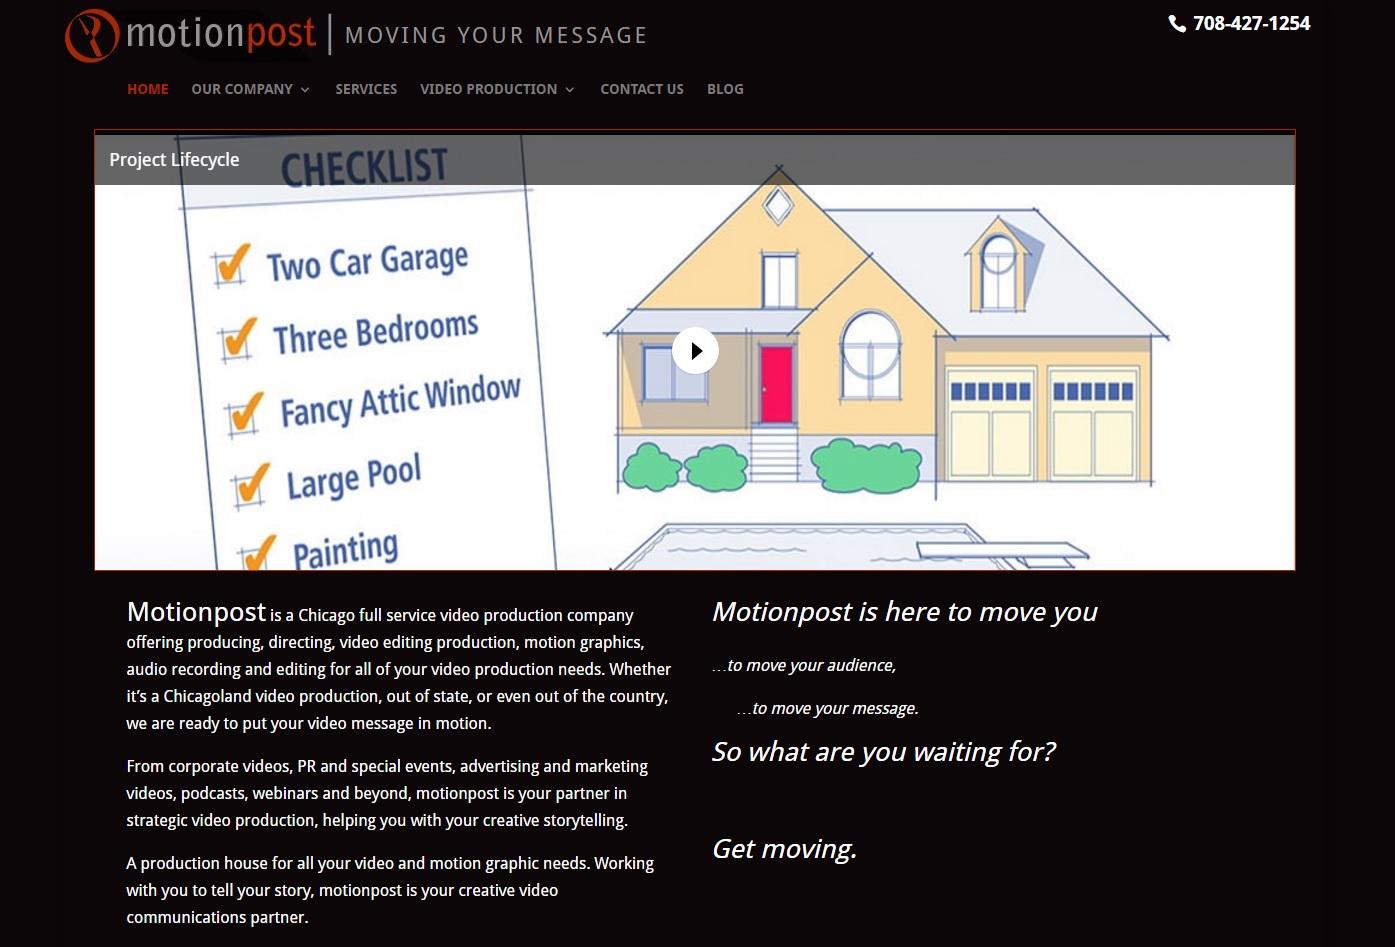 Motionpost-video-production Homepage Screenshot